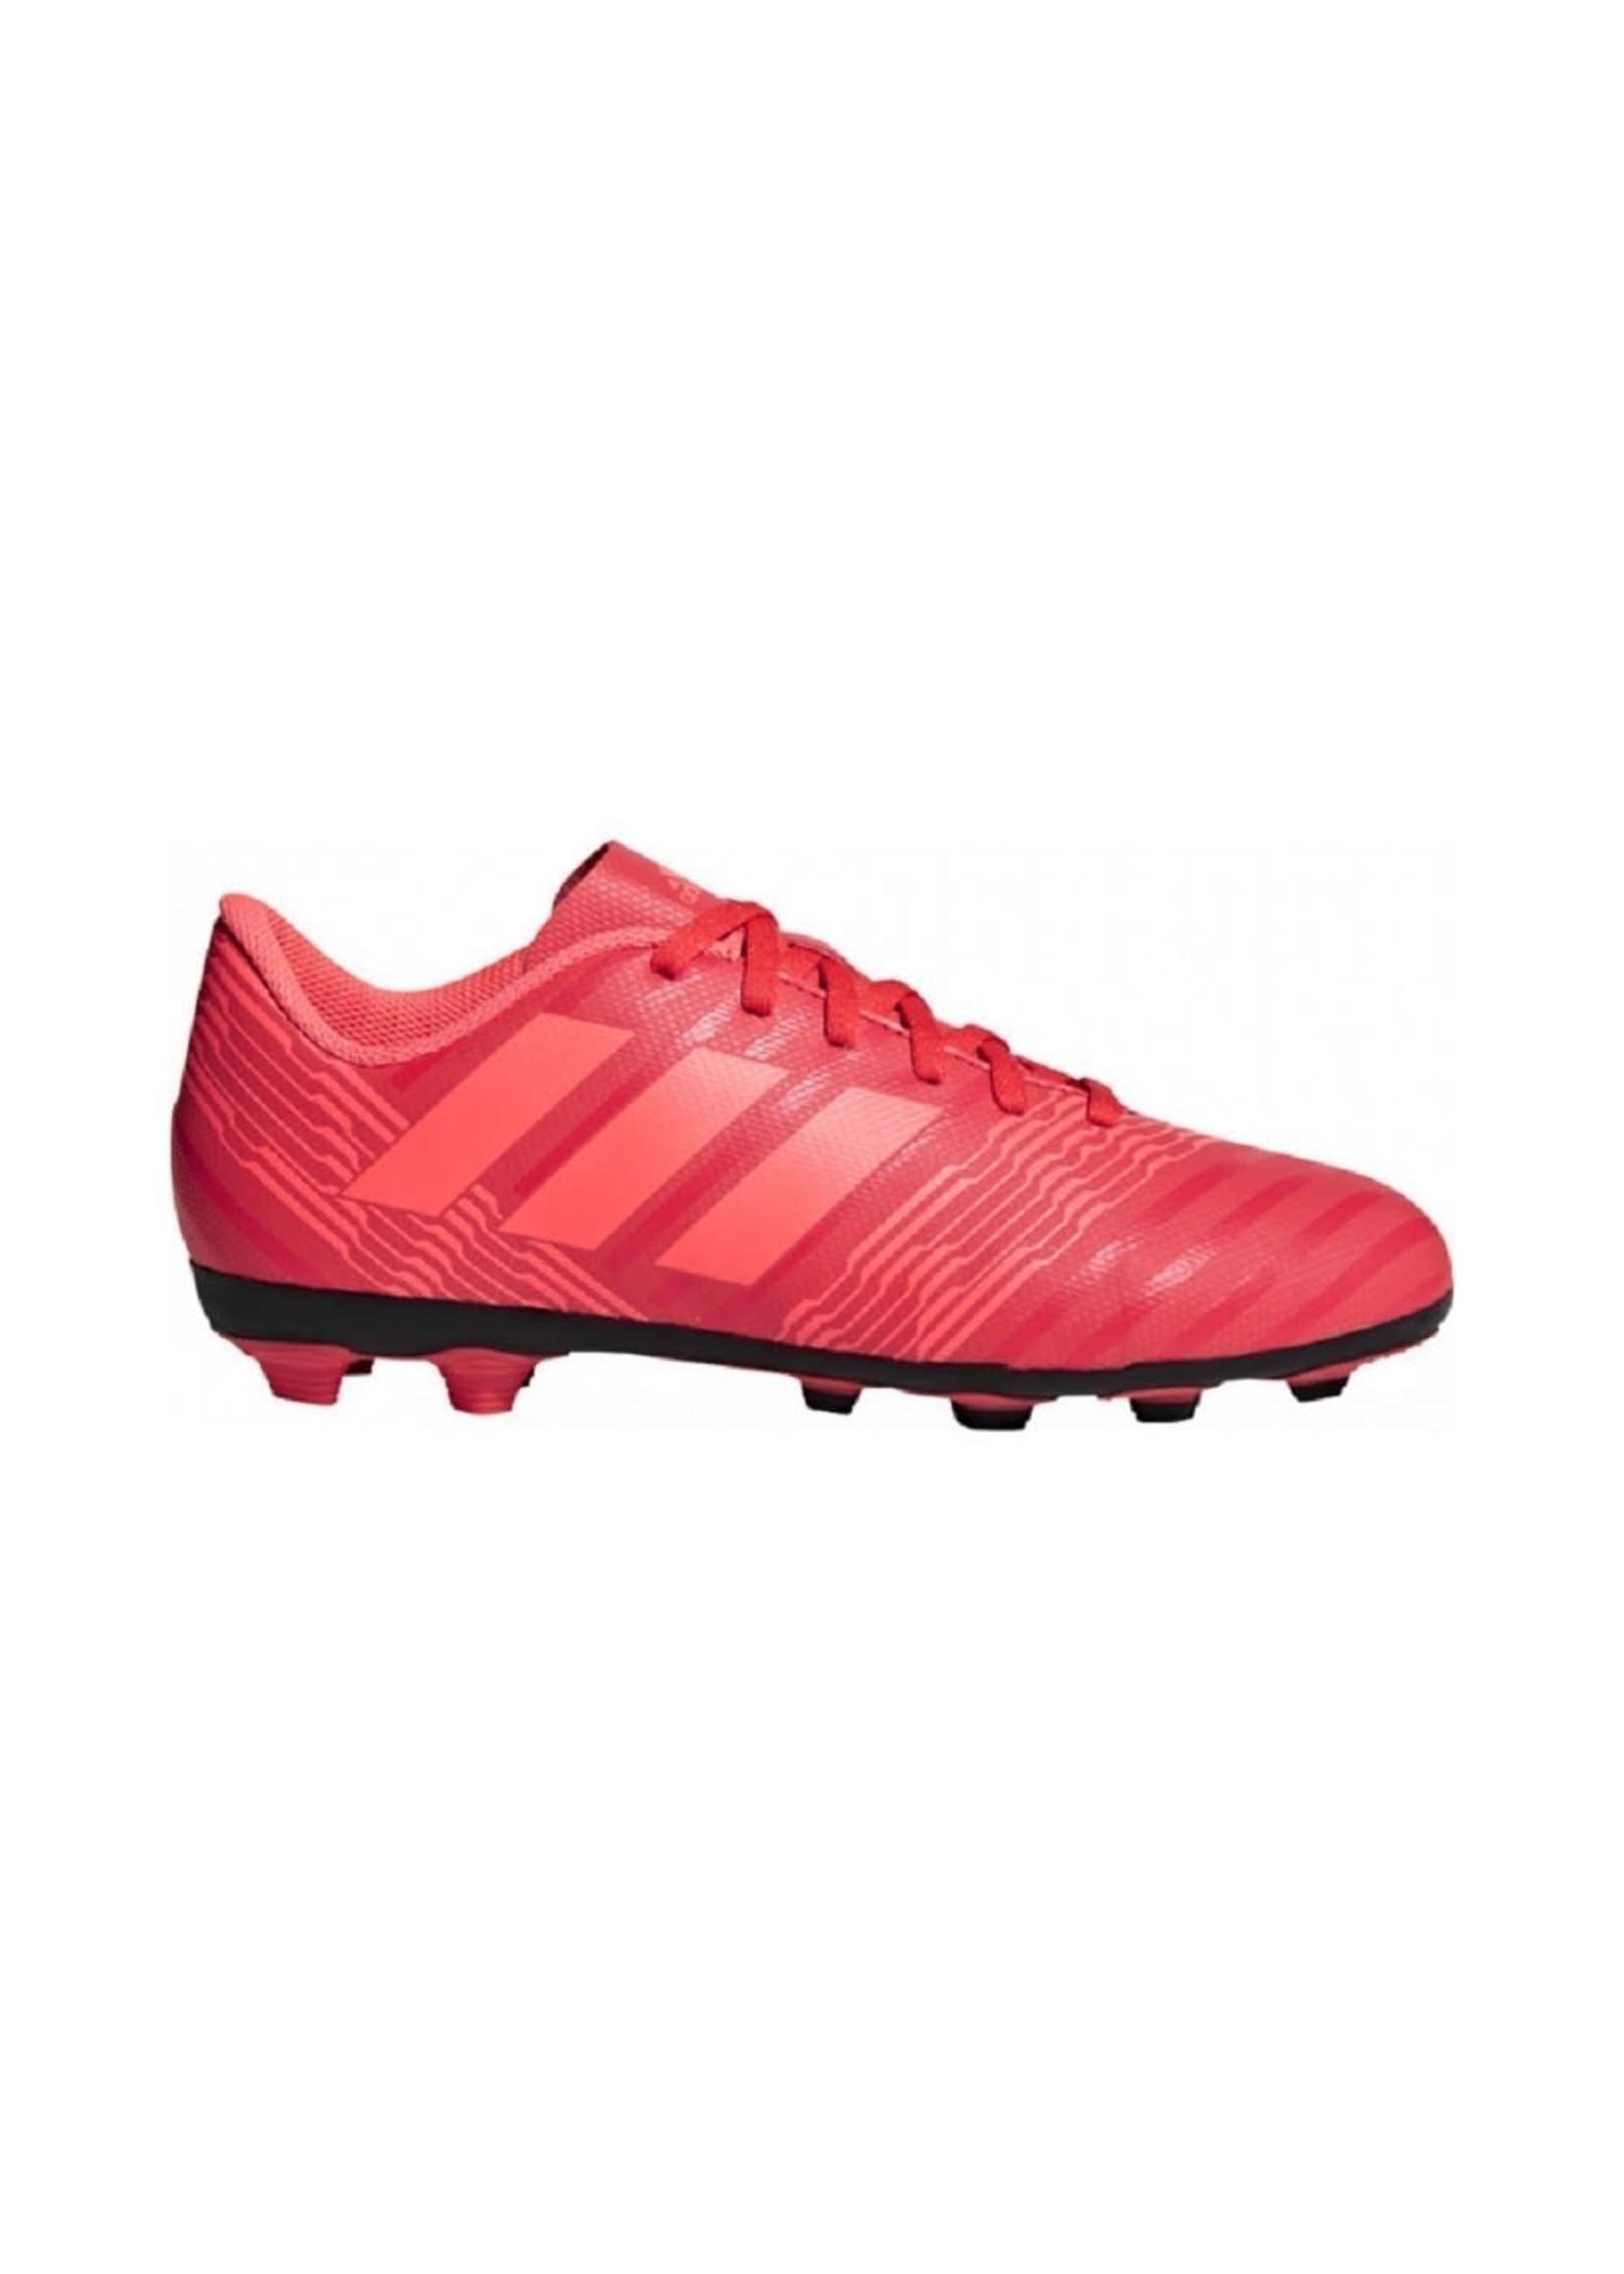 Adidas Nemeziz 17.4 FxG Jr CP9207